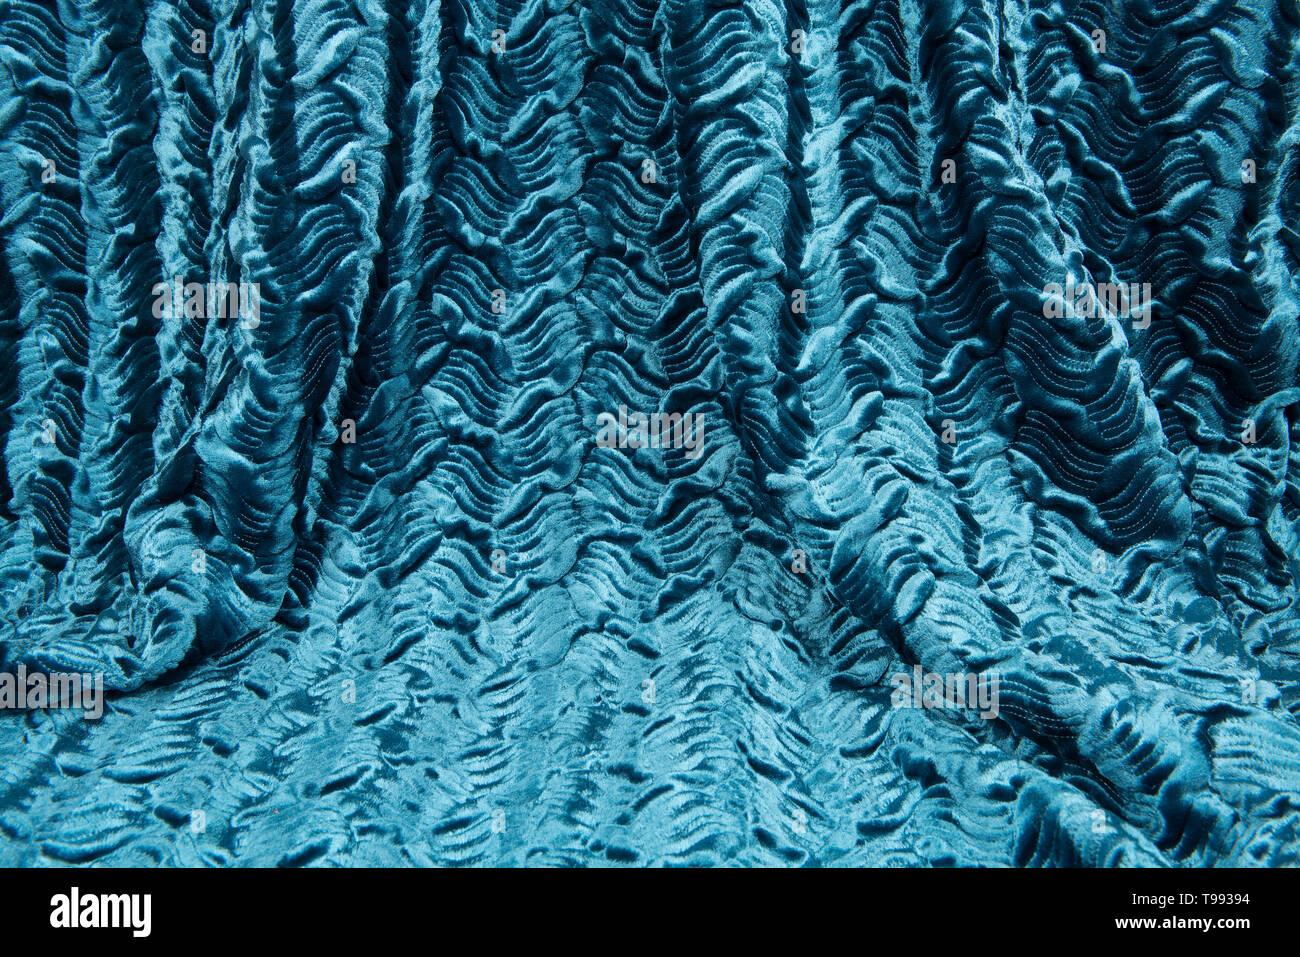 Full frame teal blue luxury shiny draped curtain - Stock Image